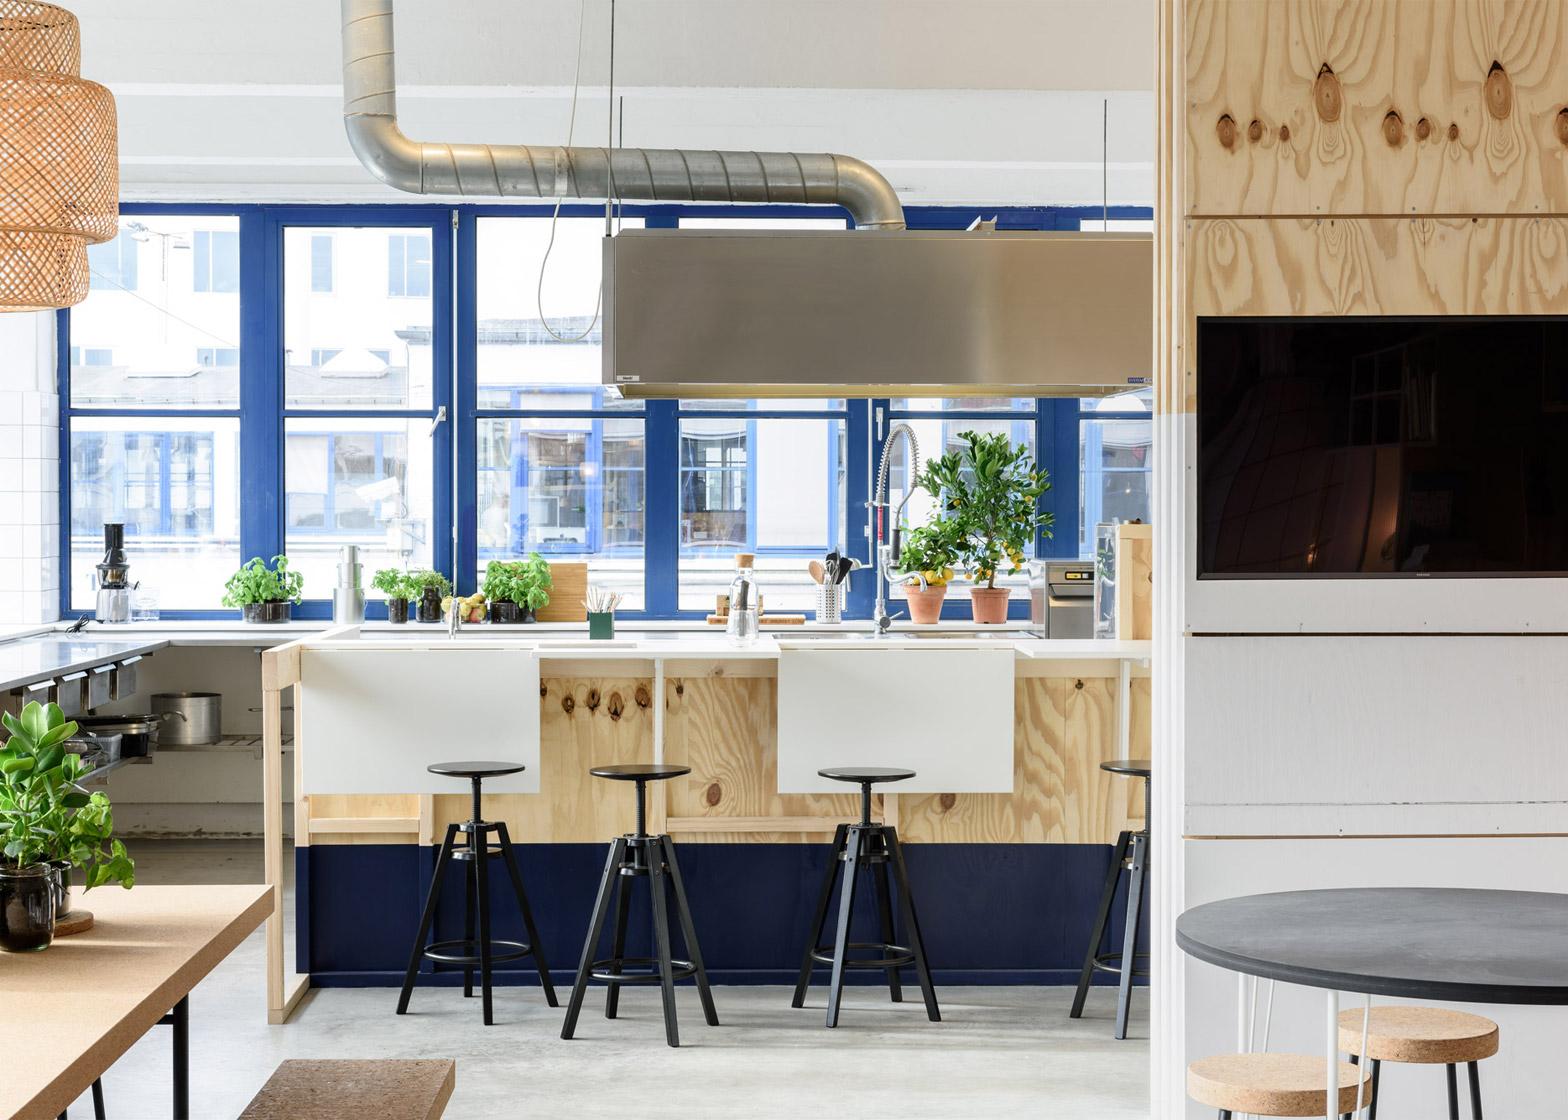 Ikea-Space-10-Innovation-Lab_Alastair-Philip-Wiper_dezeen_1568_51